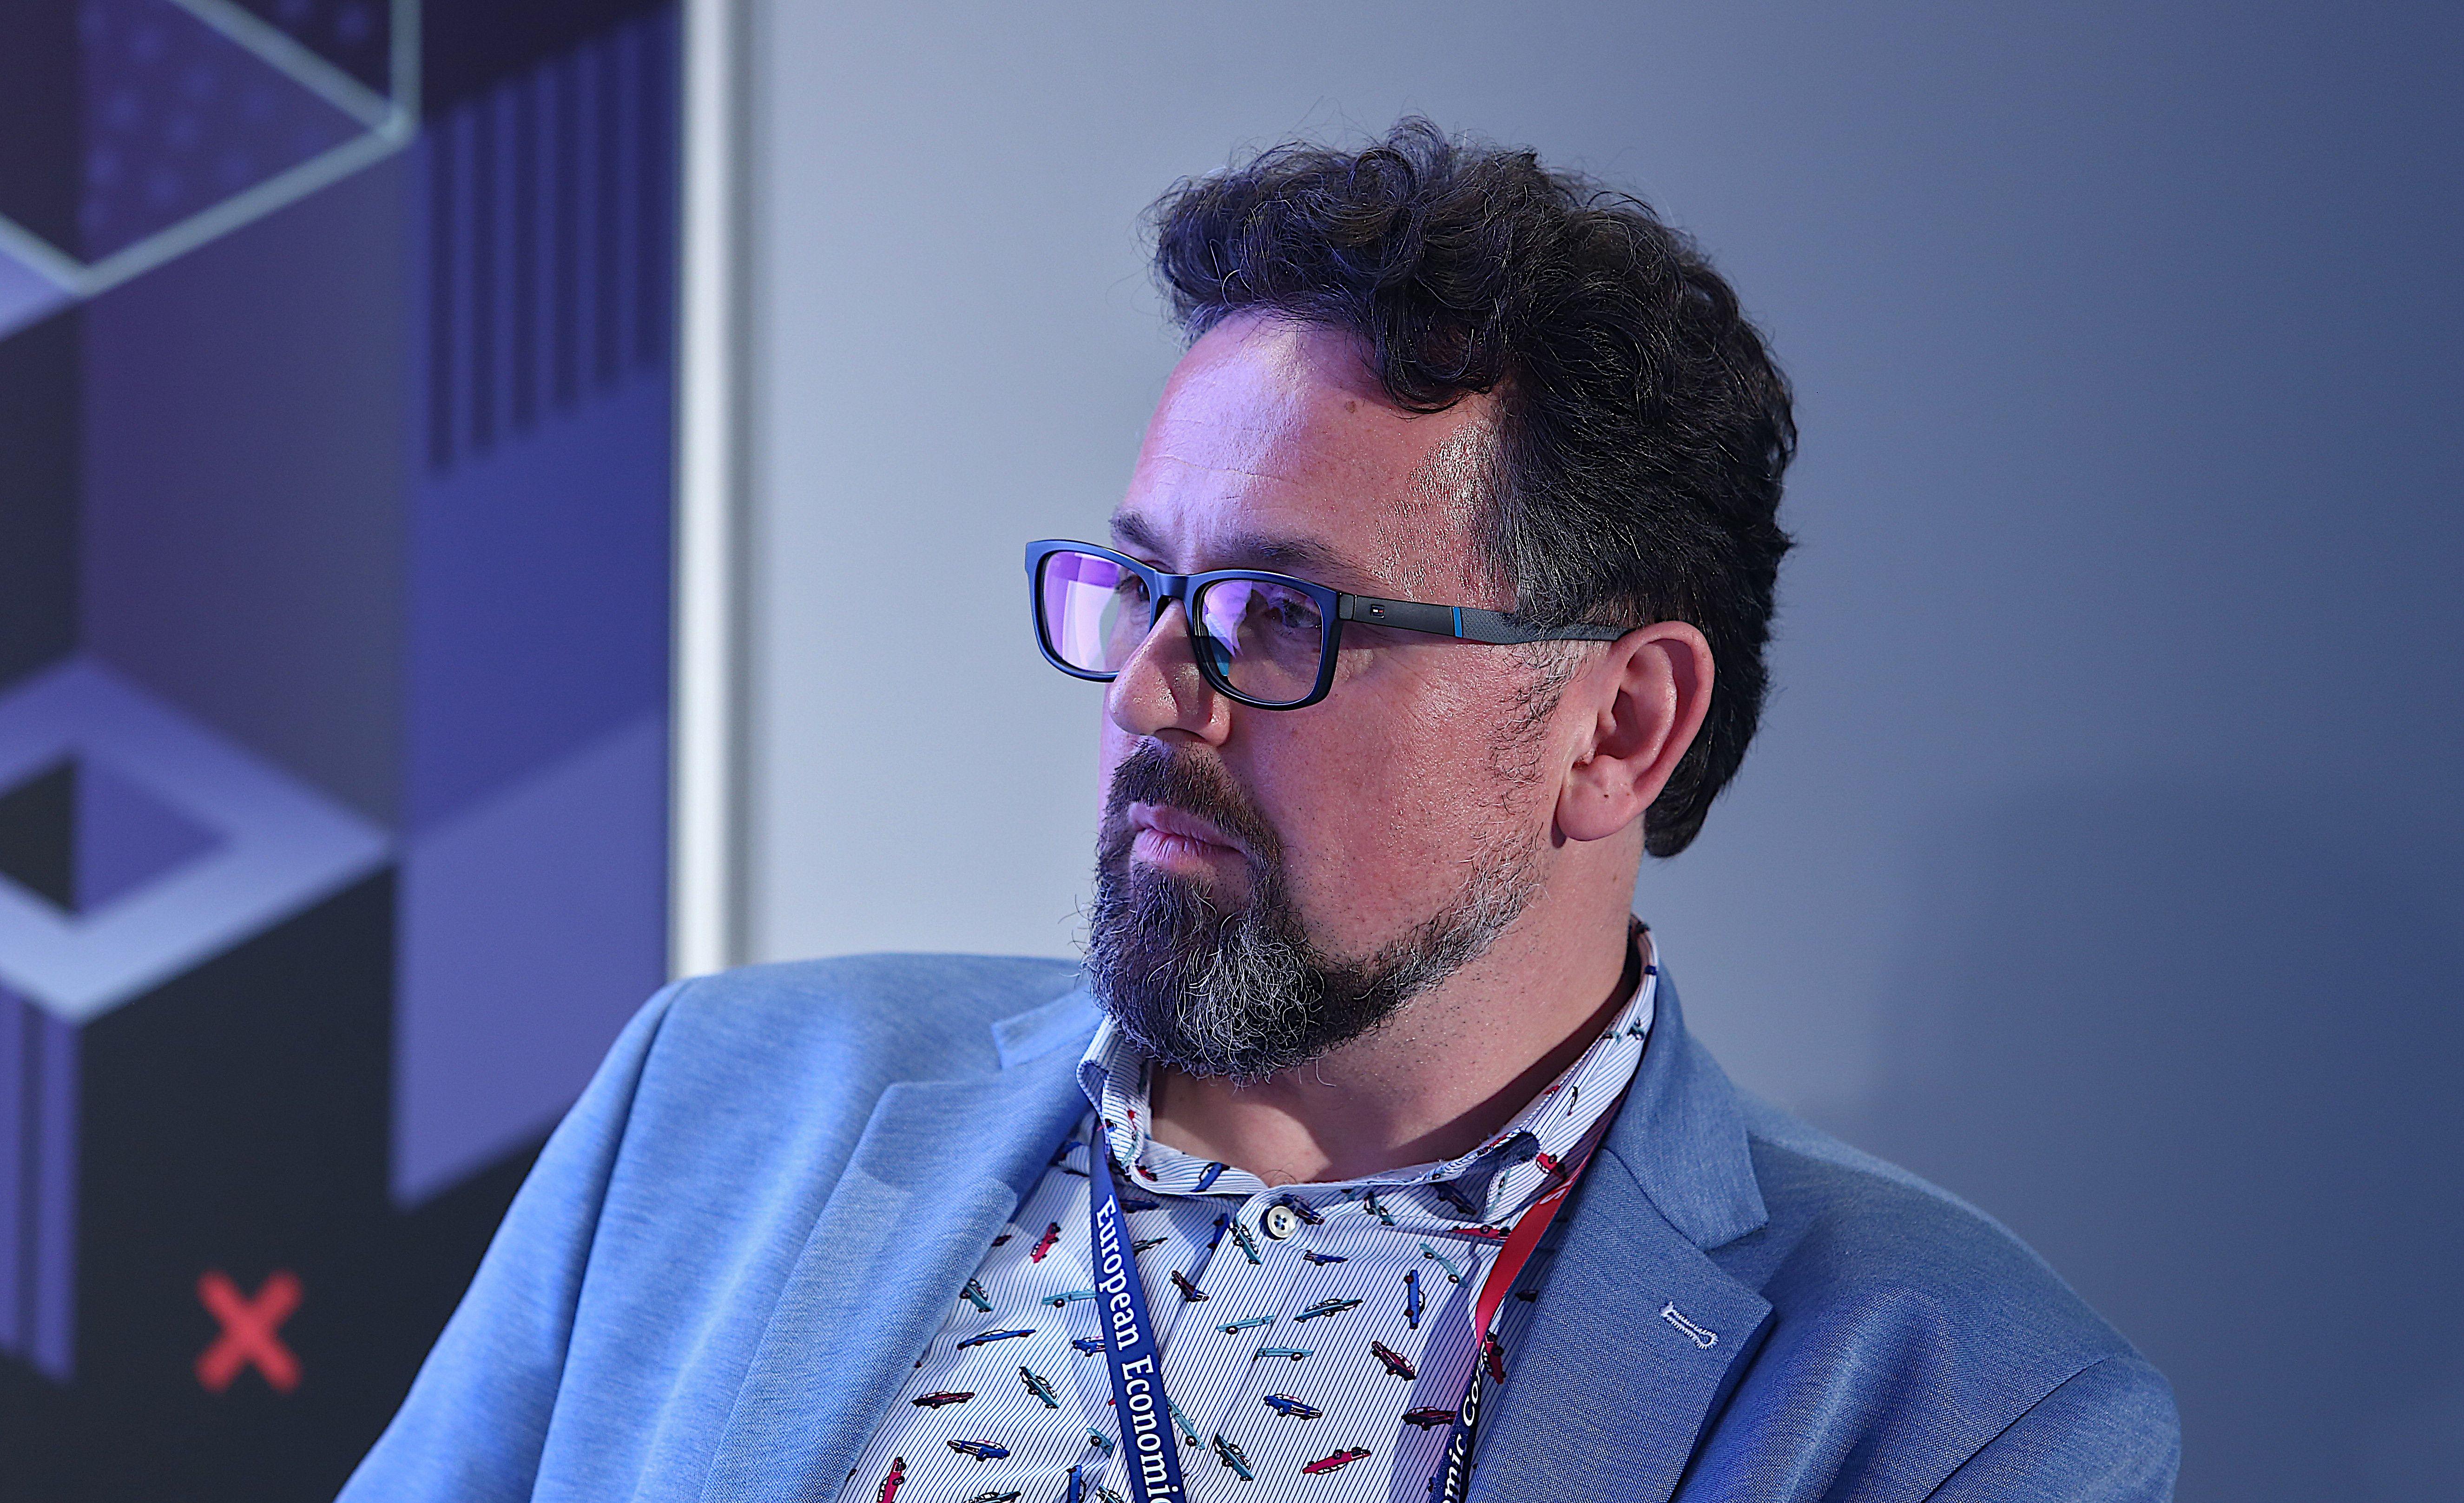 Sebastian Szymański - moderator dyskusji (fot. PTWP)